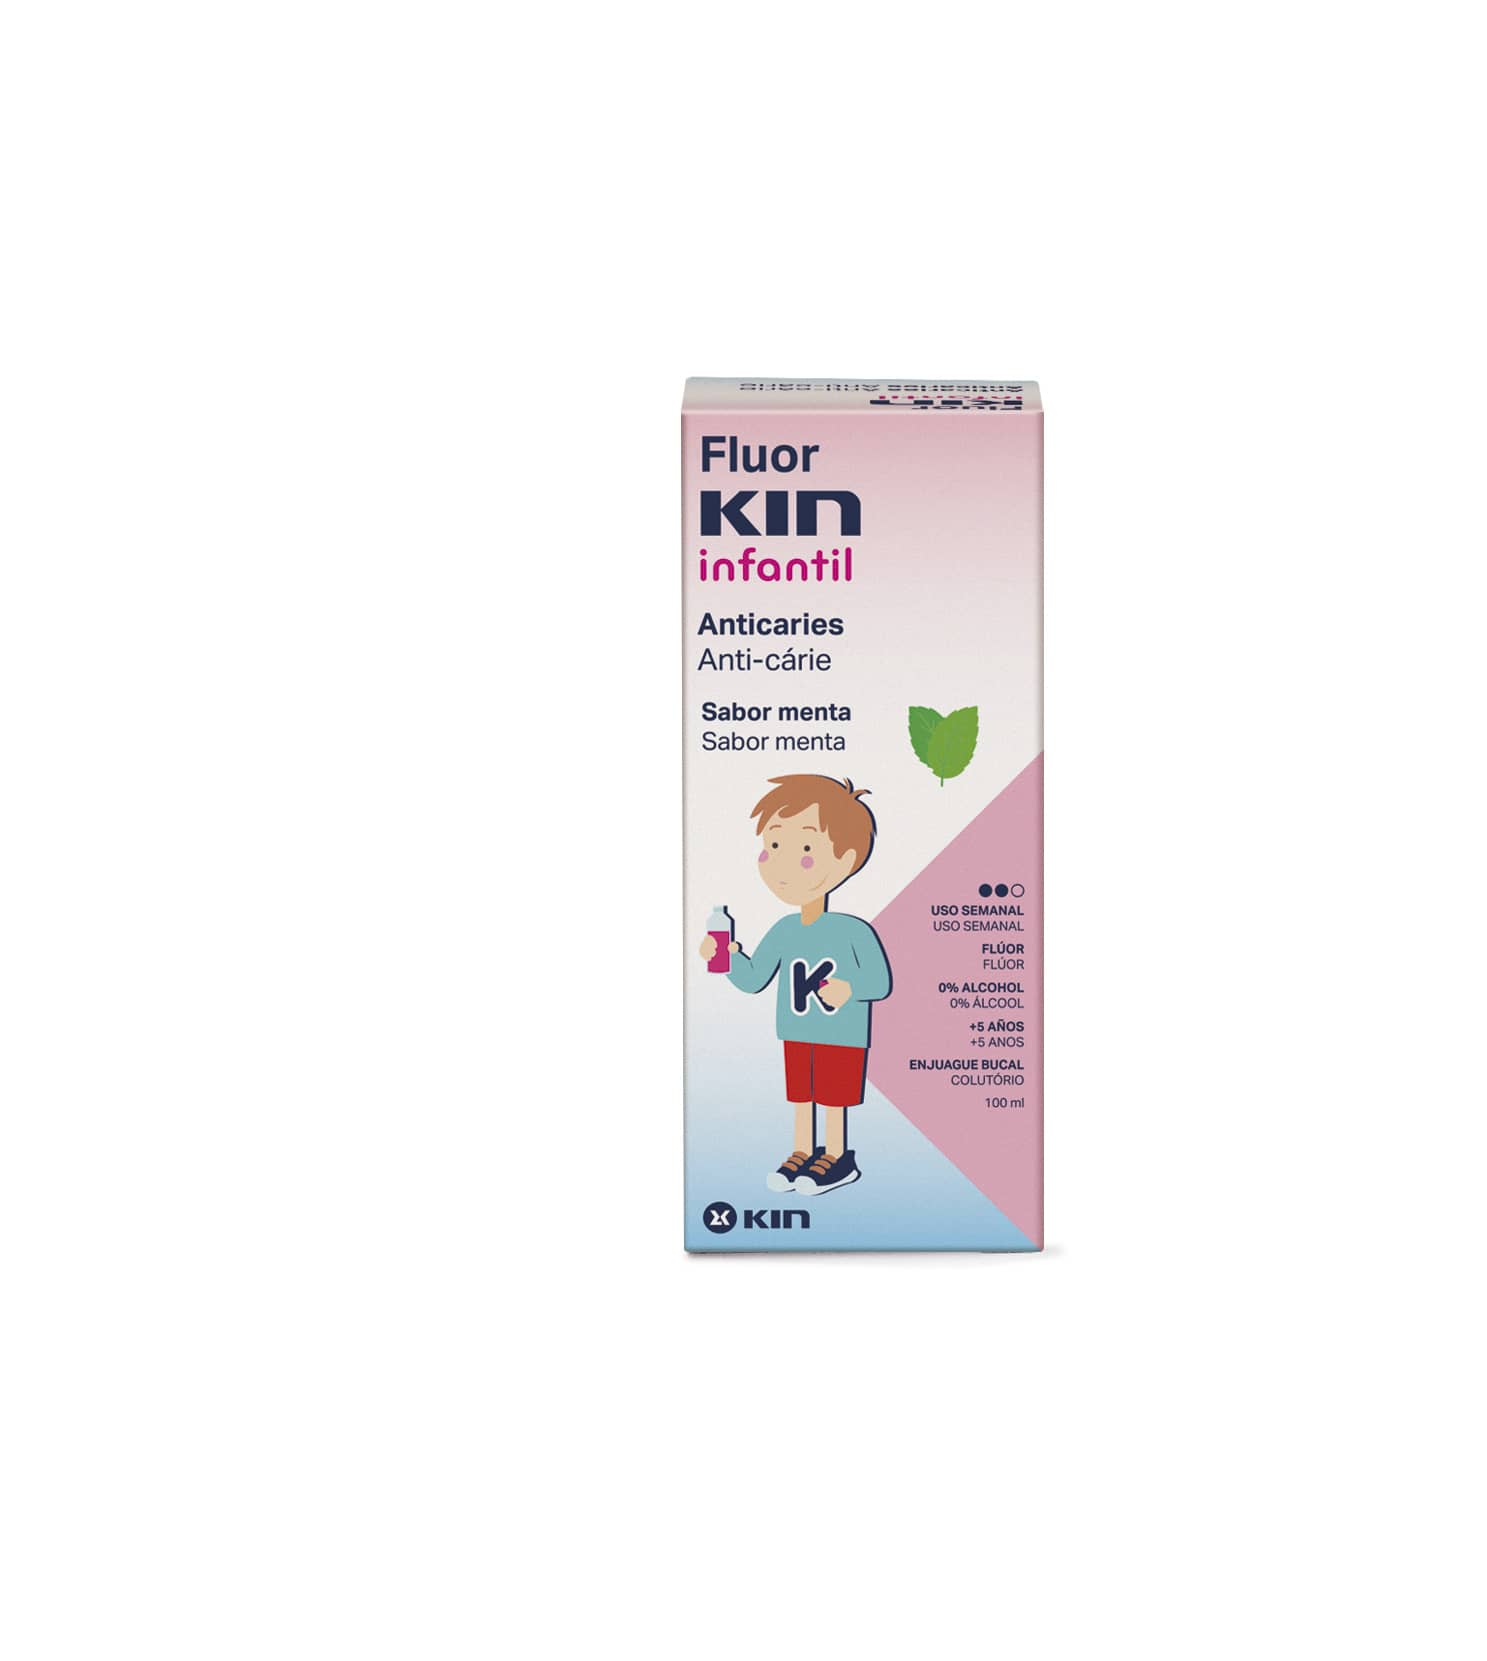 Fluor KIN Infantil Anticaries